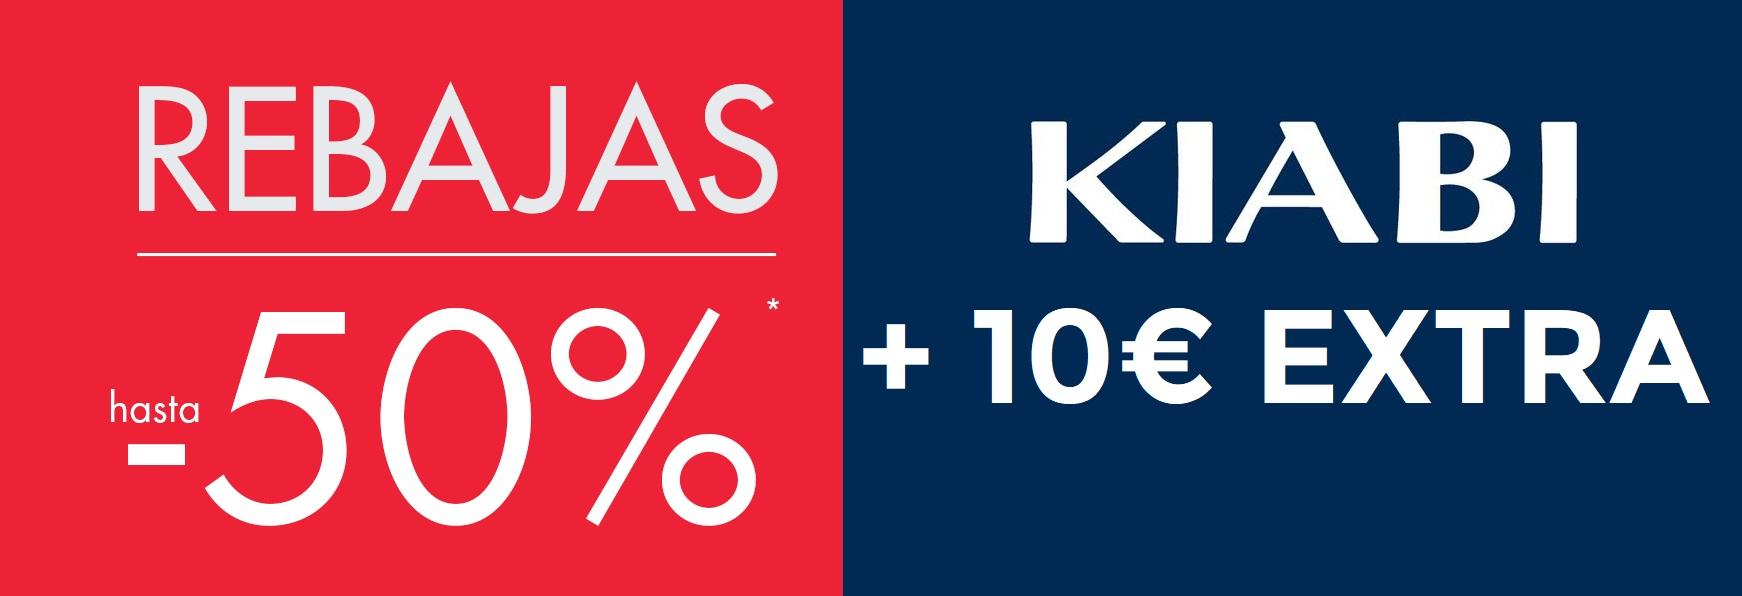 Hasta 50% + 10€ EXTRA en Kiabi